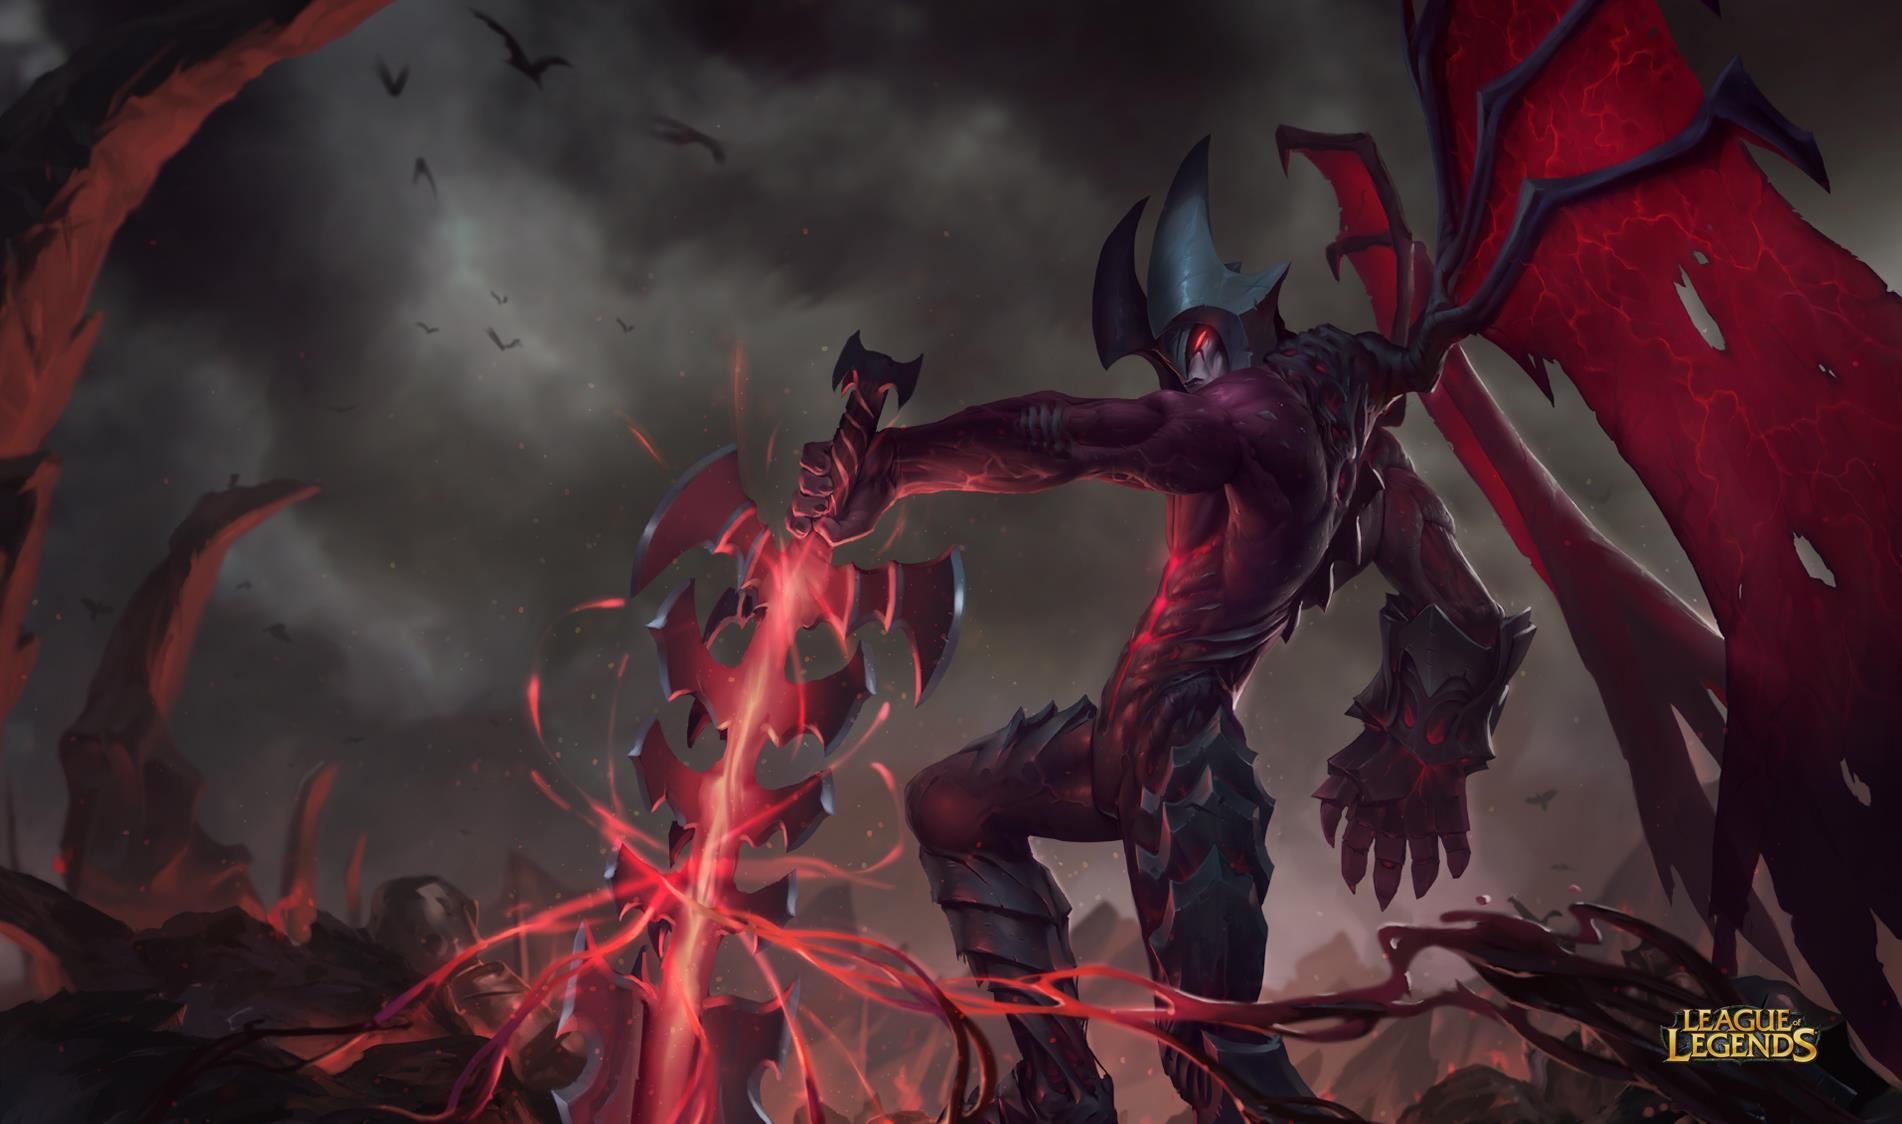 Riot Games unveils new 'League of Legends' champion: Aatrox